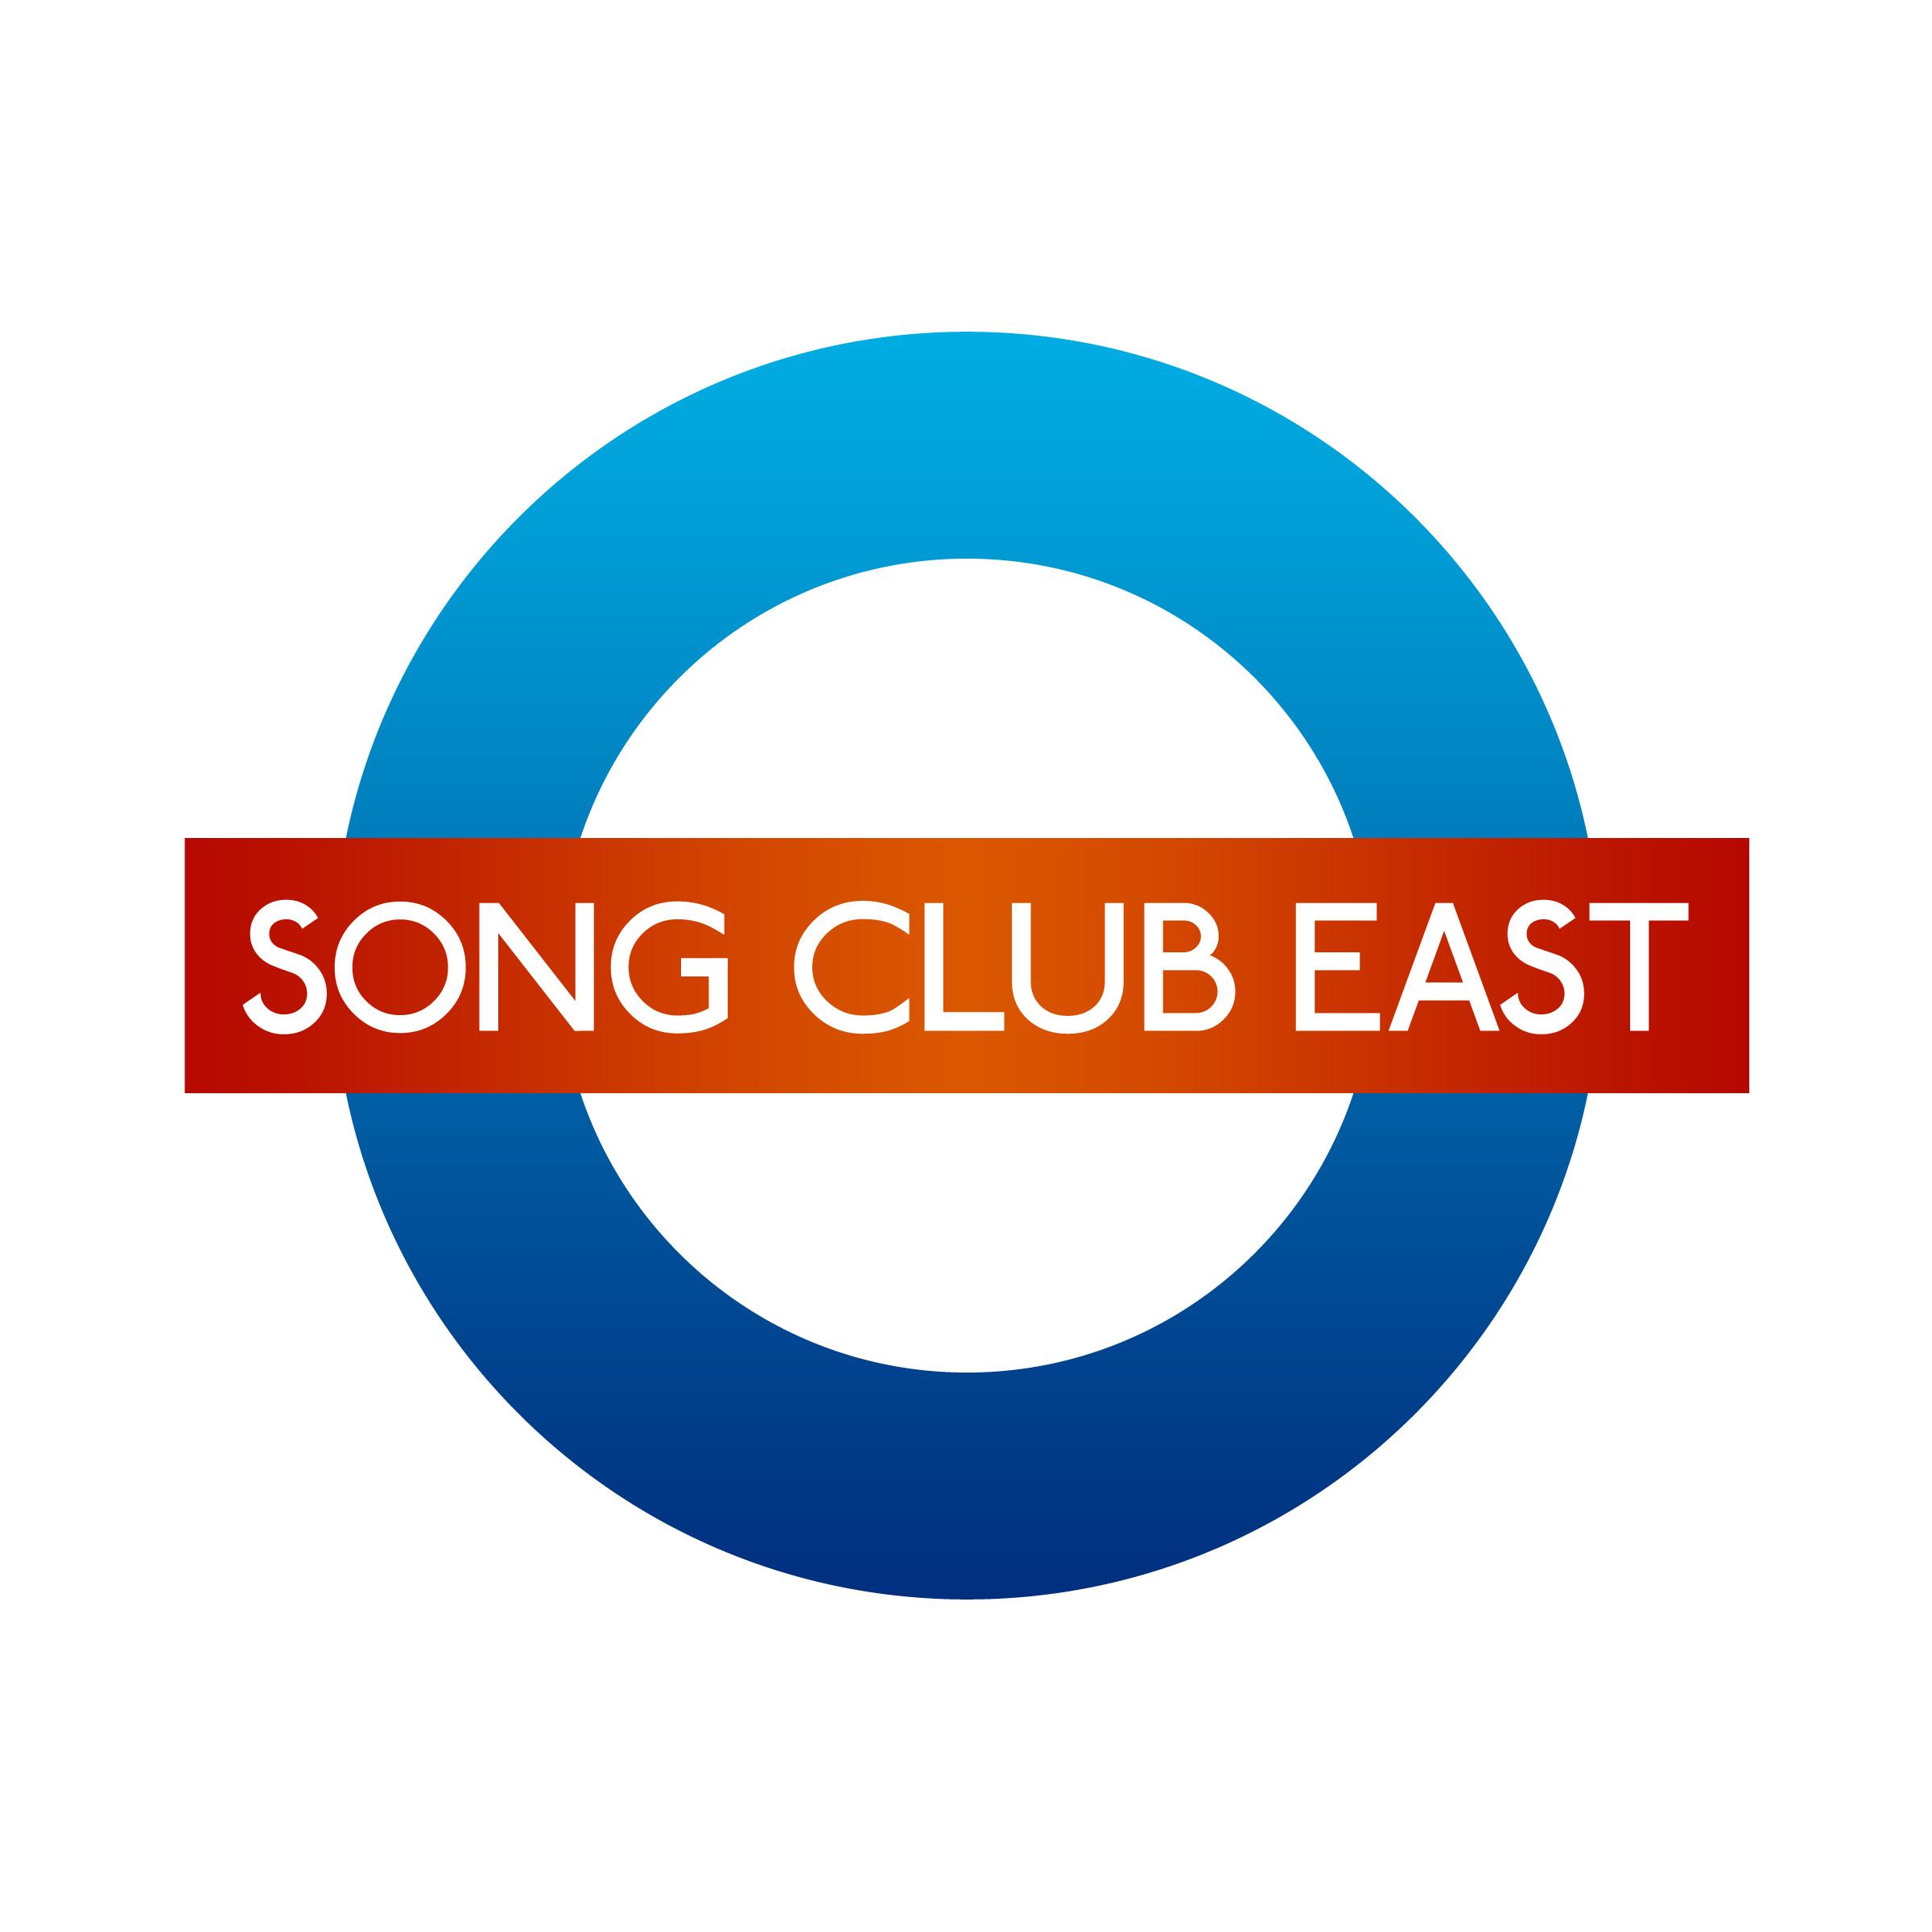 09.12 Song Club East Logo.jpg